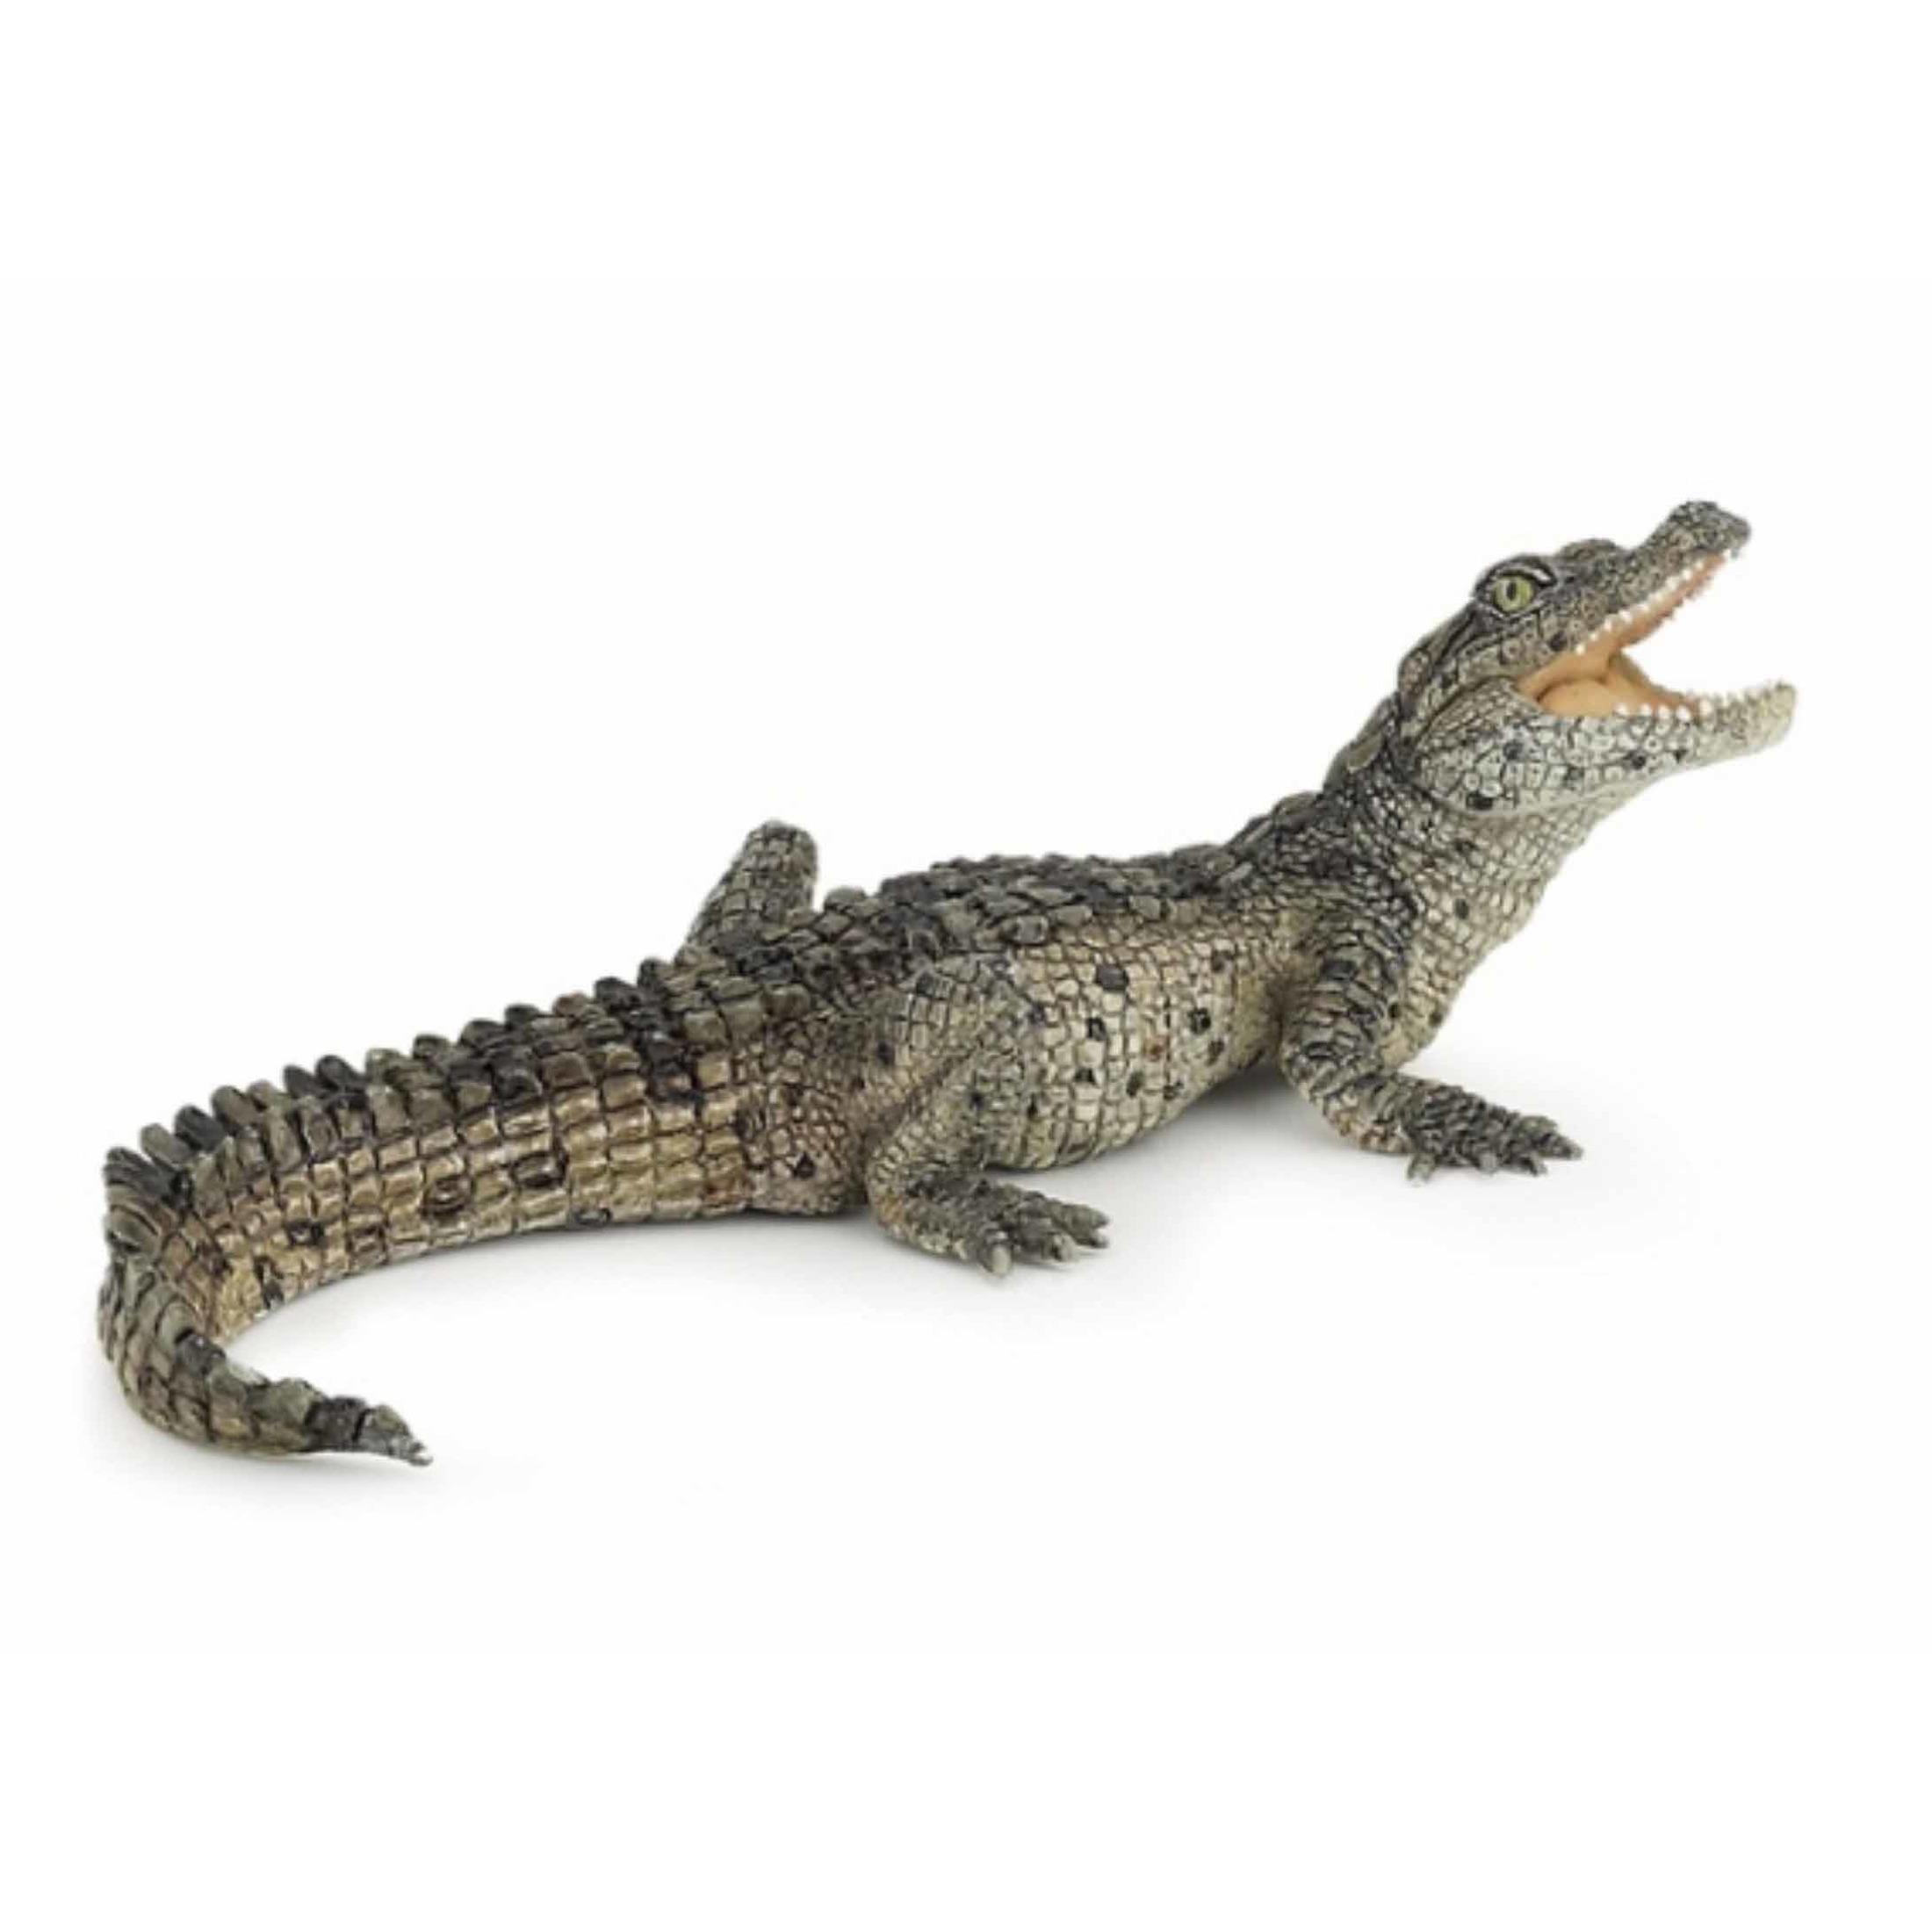 Plastic/rubber speelgoed figuur krokodil 10 cm